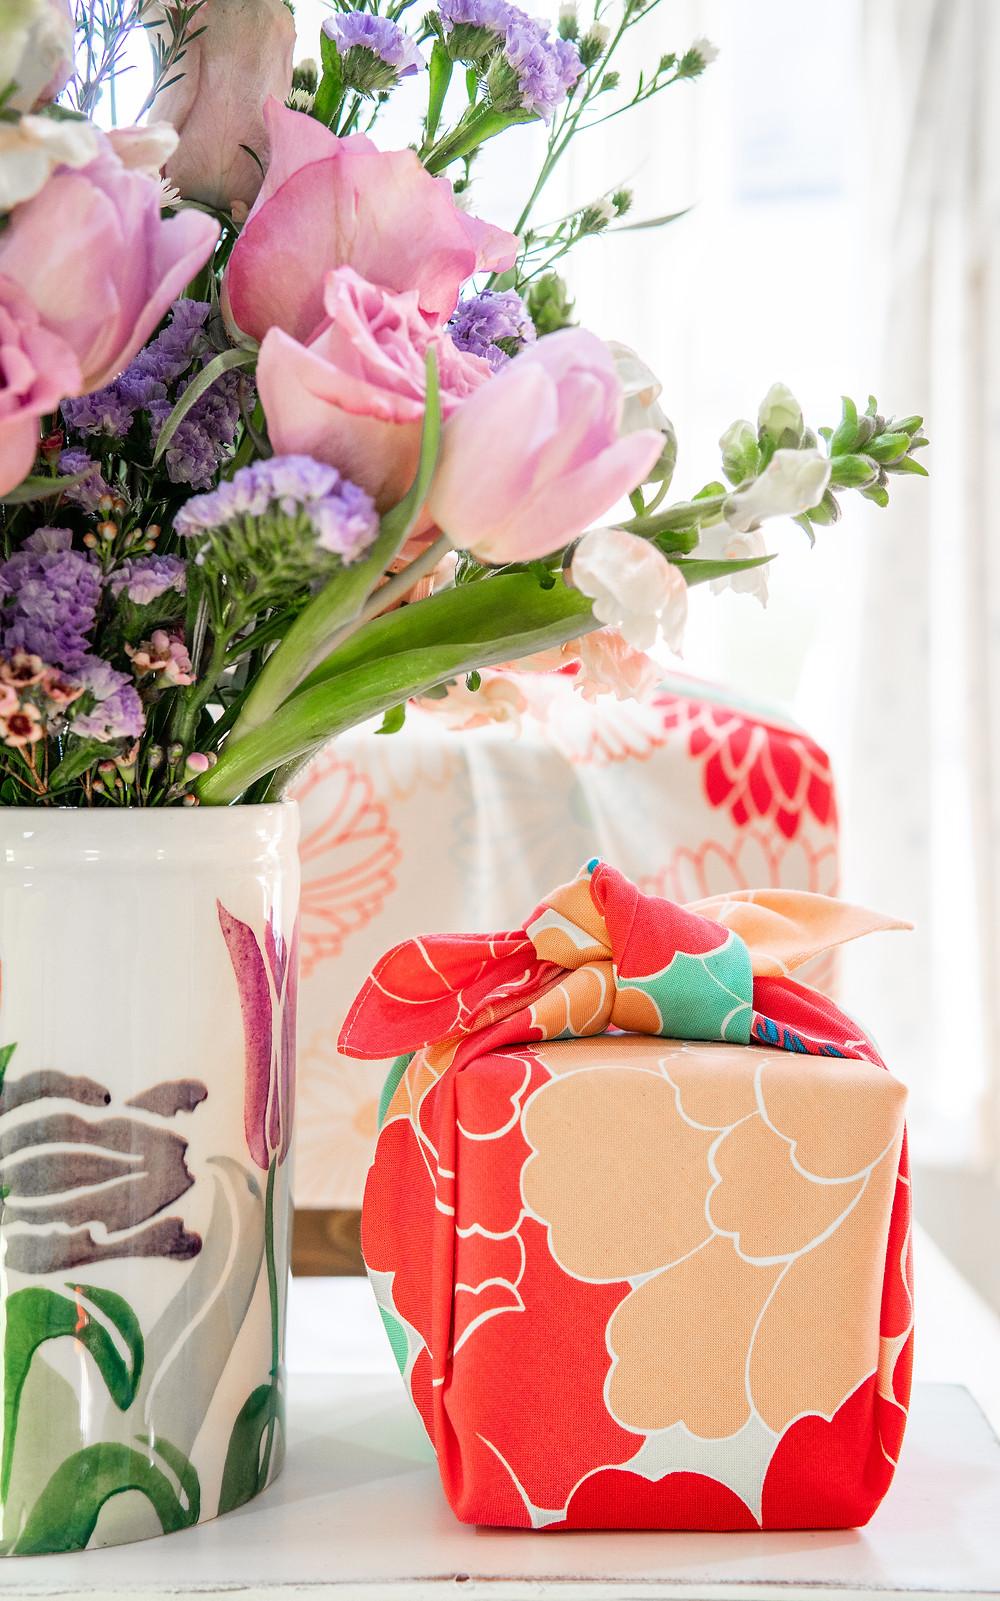 Zusetsu store furoshiki, flowers and gifts